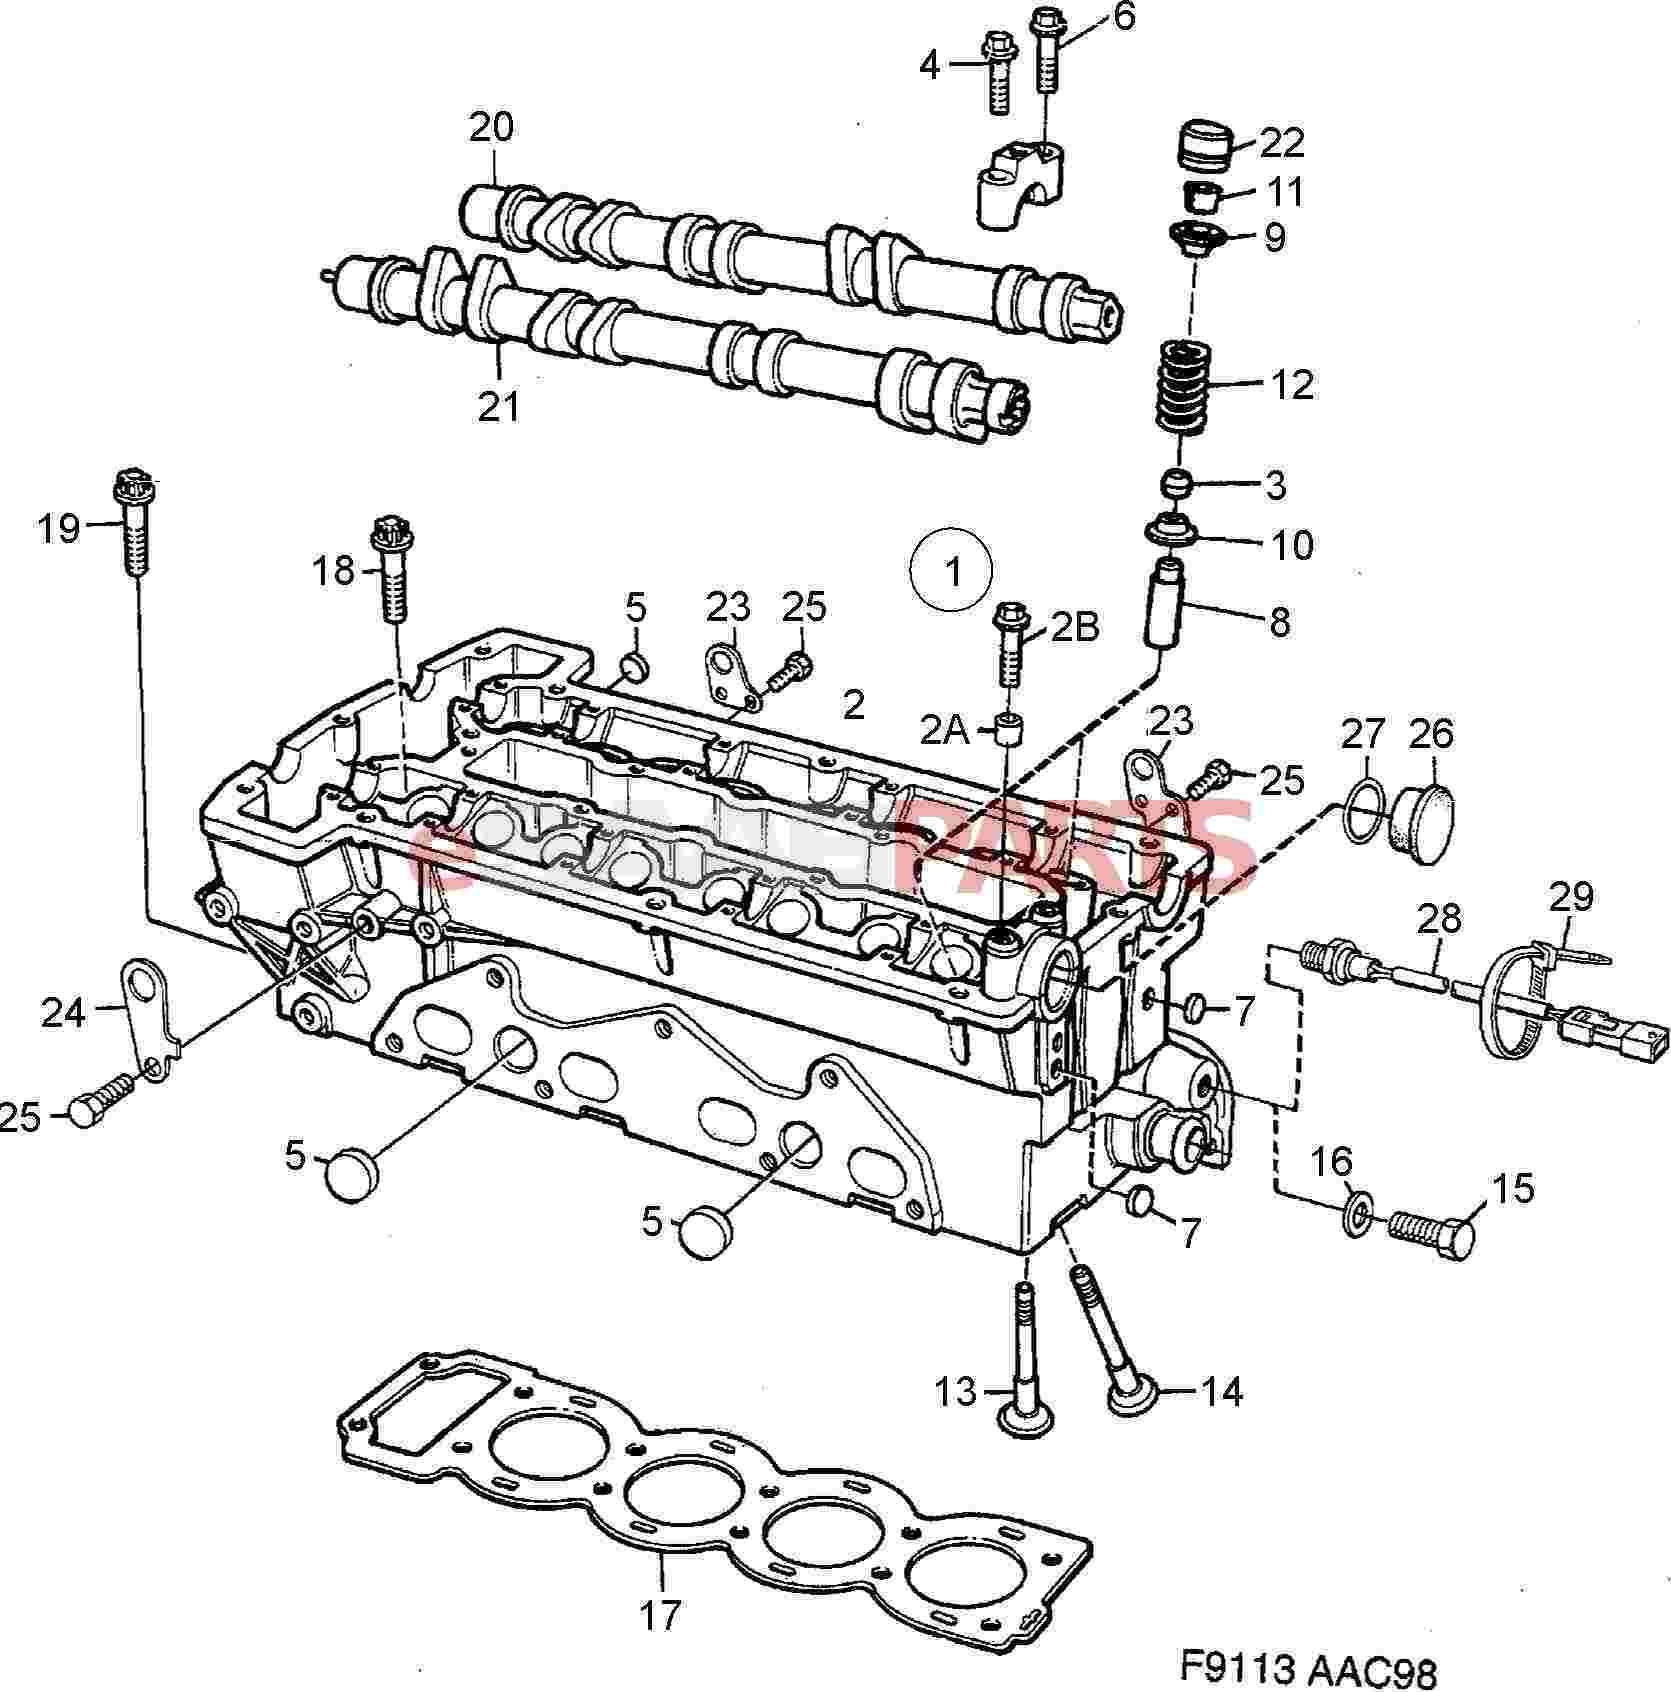 Chrysler Pt Cruiser Purge Valve Solenoid